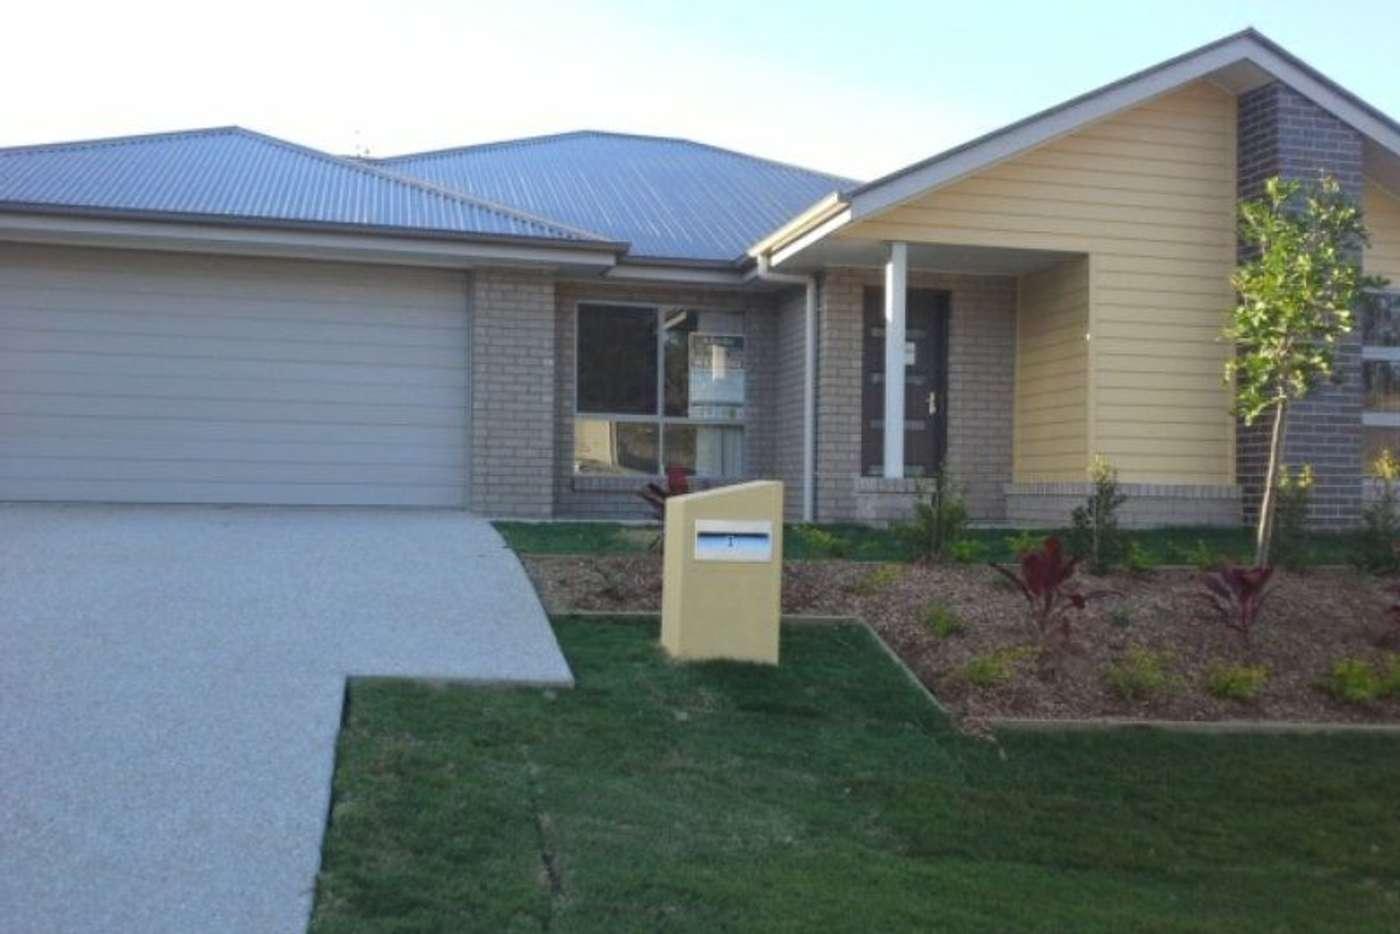 Main view of Homely house listing, 2 Josephine Street, Boyne Island QLD 4680